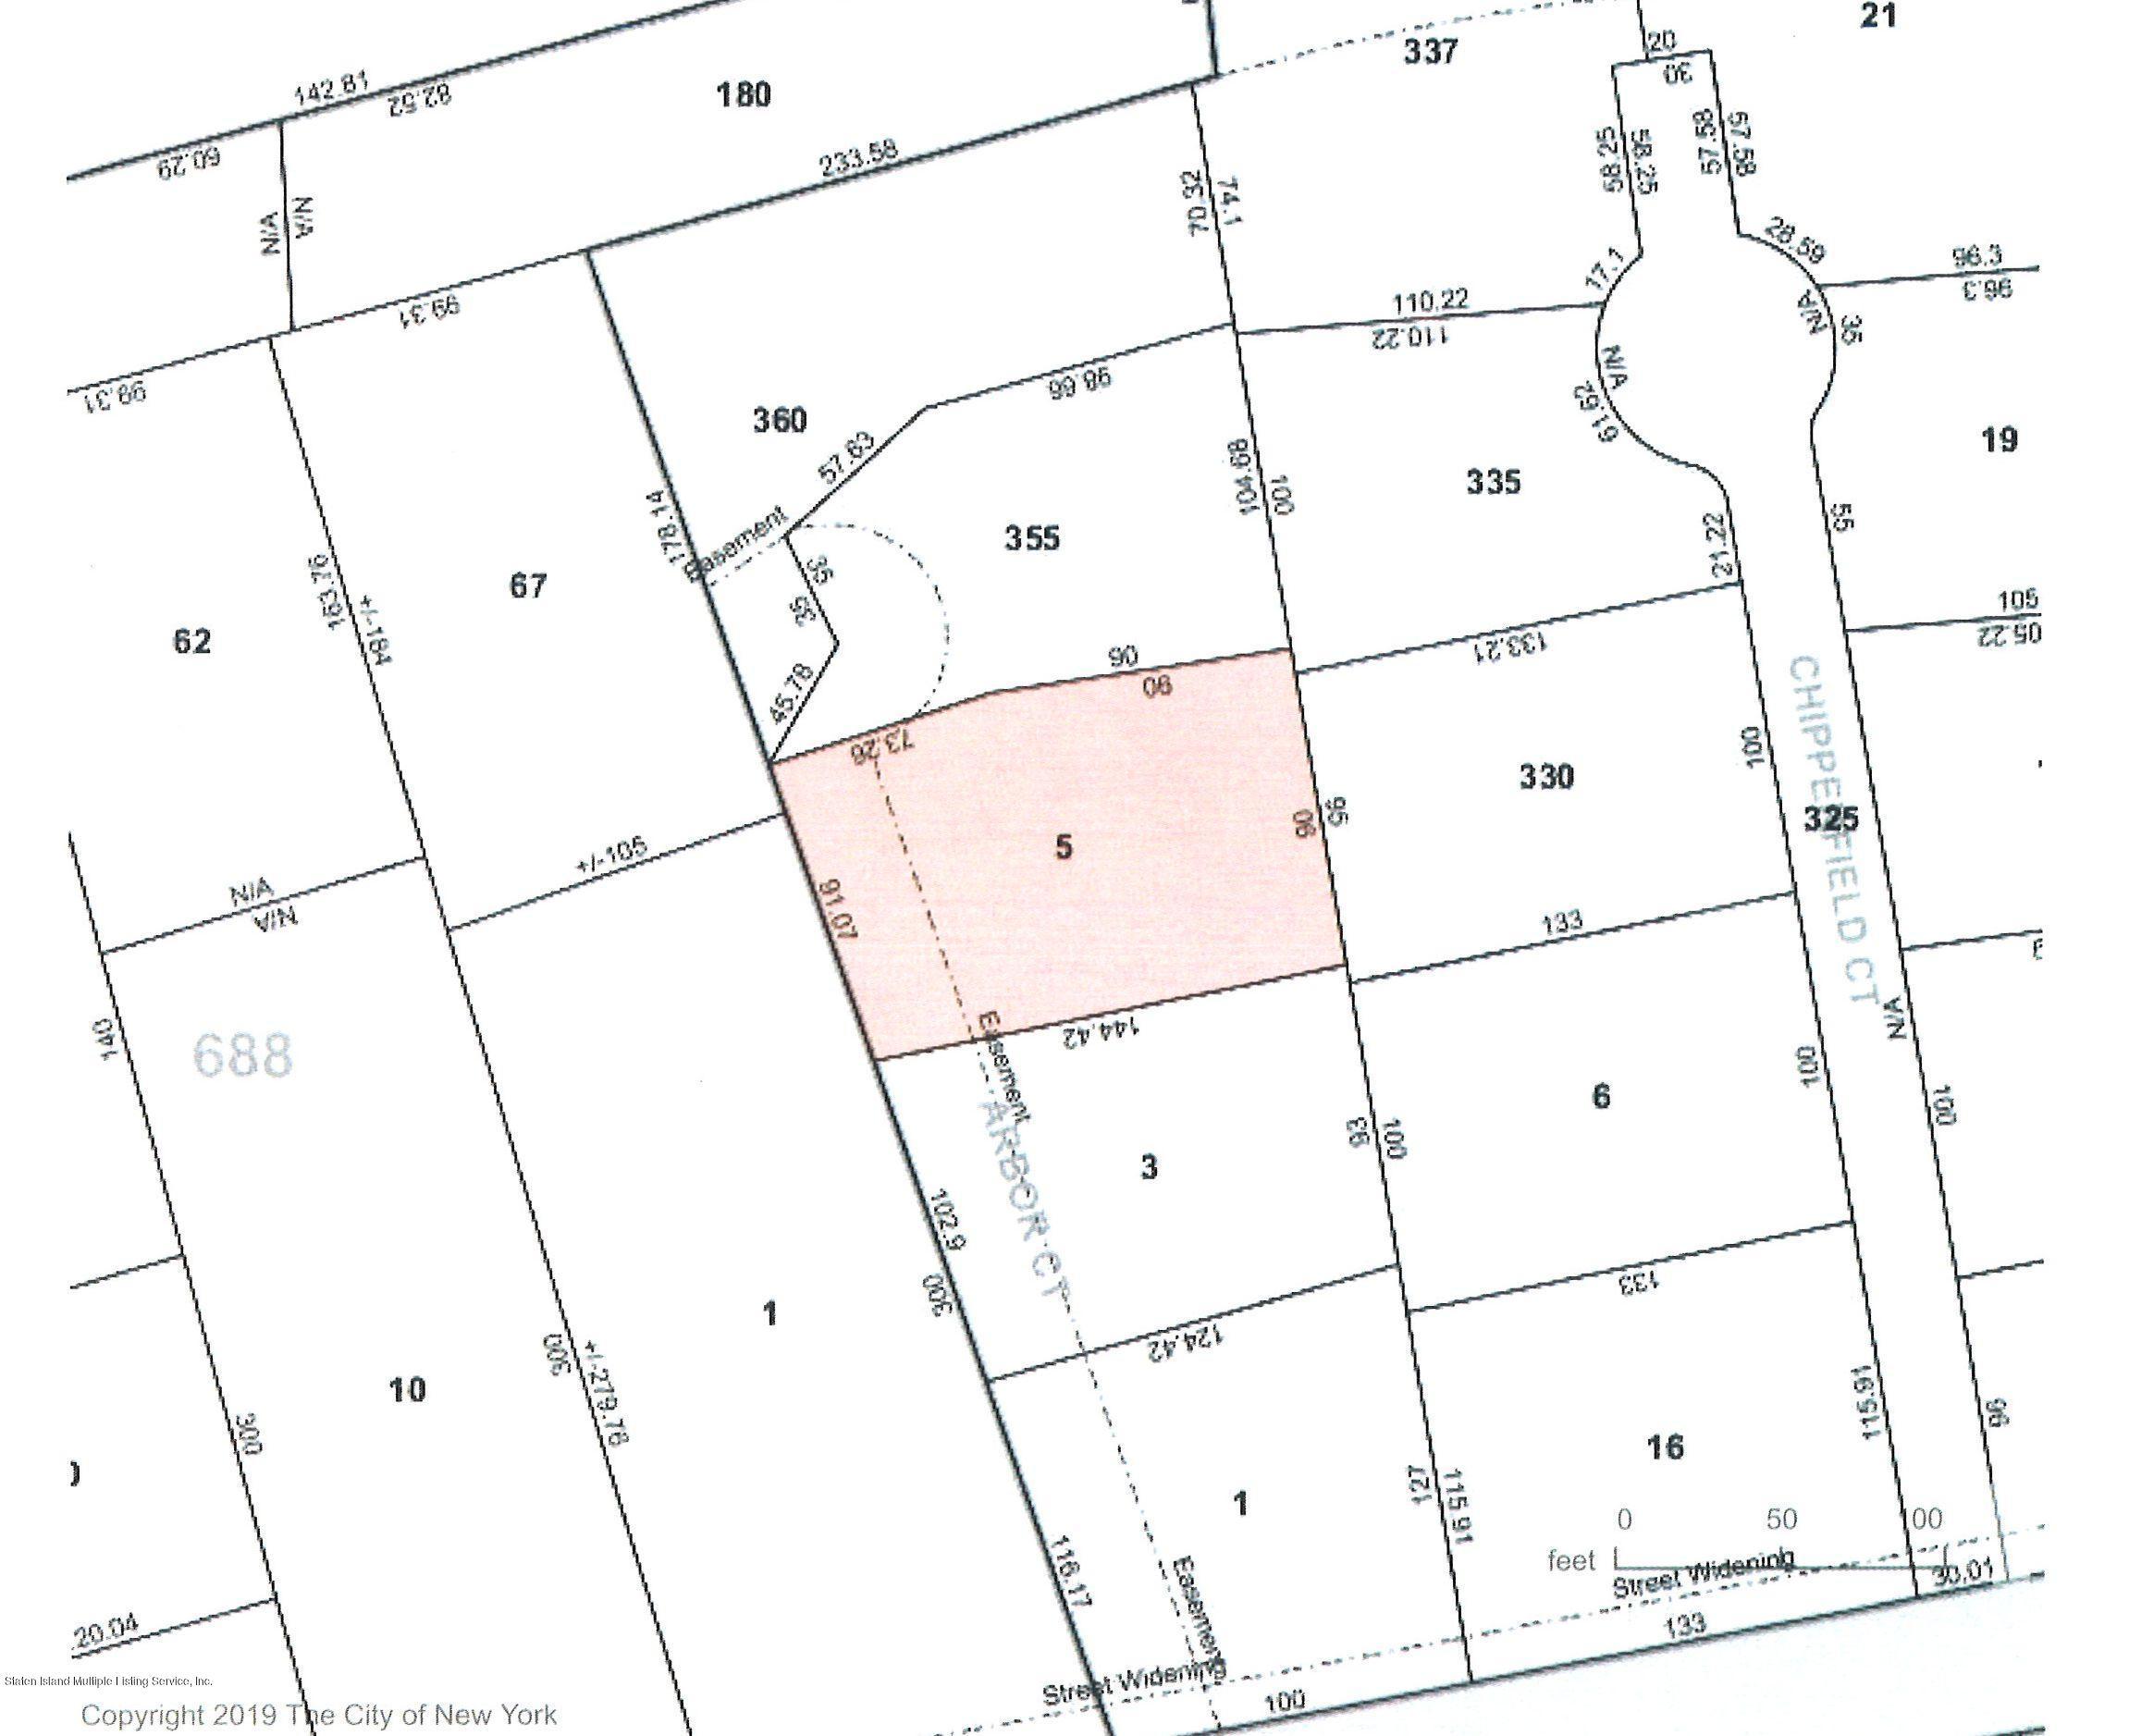 Single Family - Detached 35 Arbor Court  Staten Island, NY 10301, MLS-1126173-22